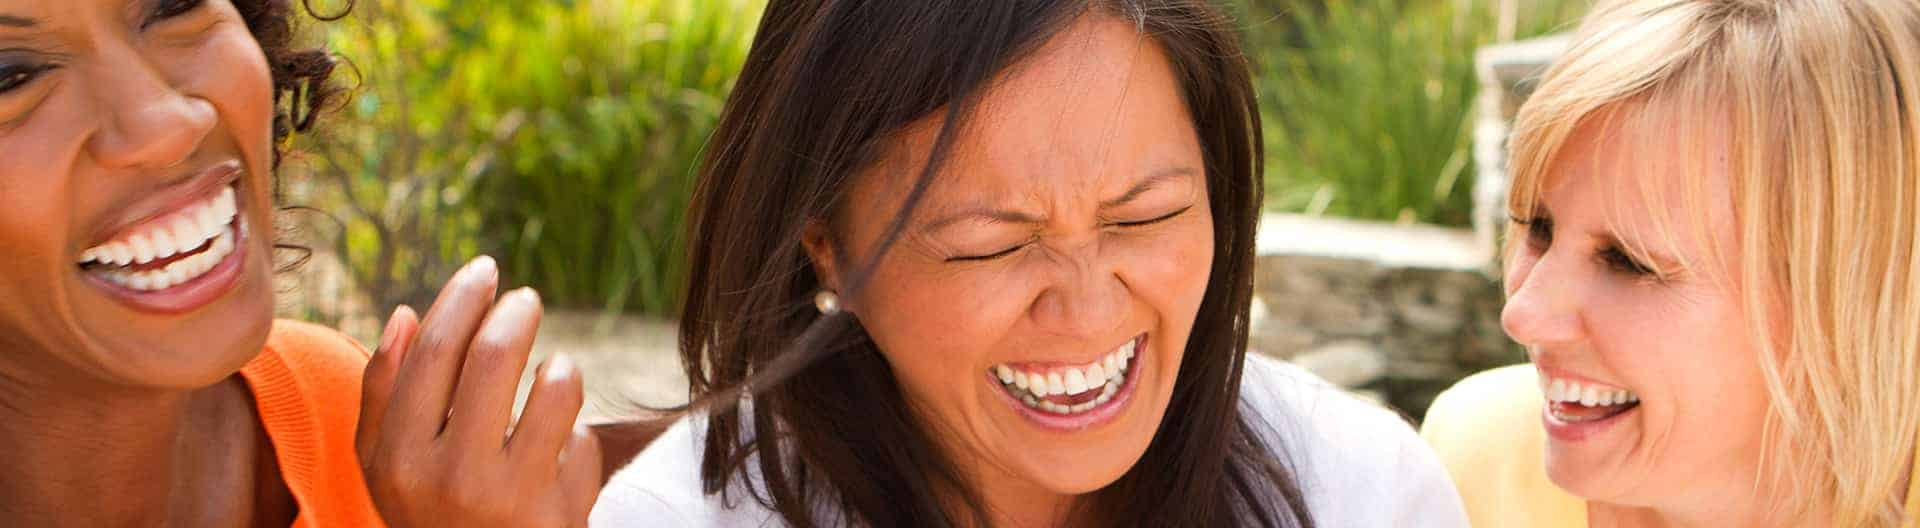 friends laughin